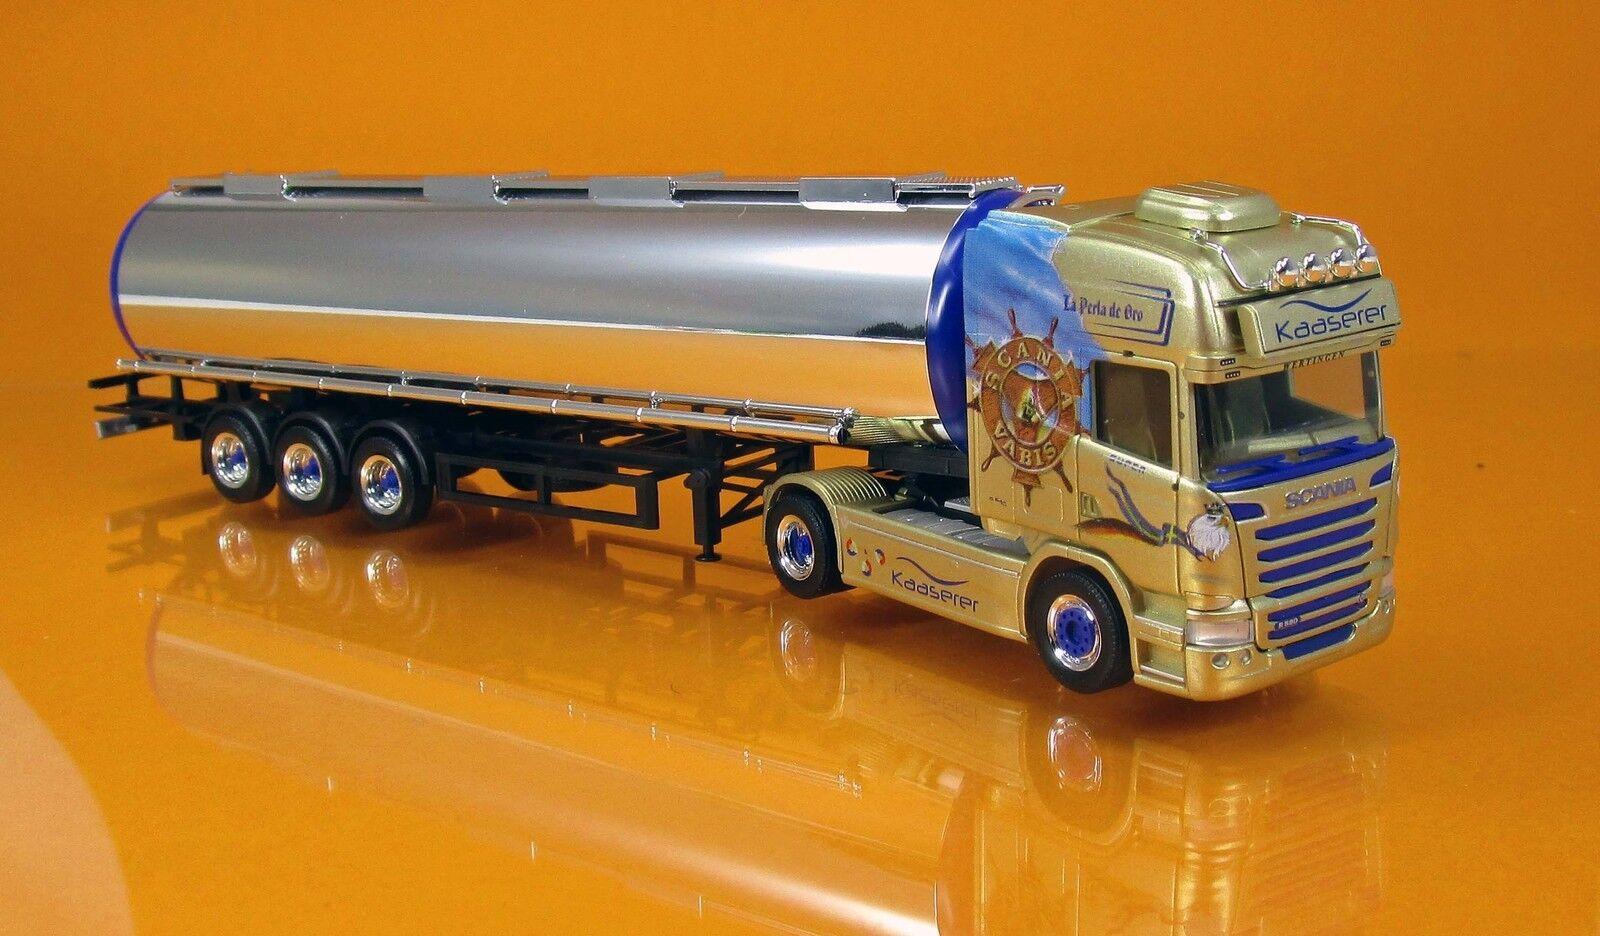 Herpa 306508 Scania R 13 Chromtank camions kaaserer élimination élimination élimination Scale 1 87 Nouveau neuf dans sa boîte a19531